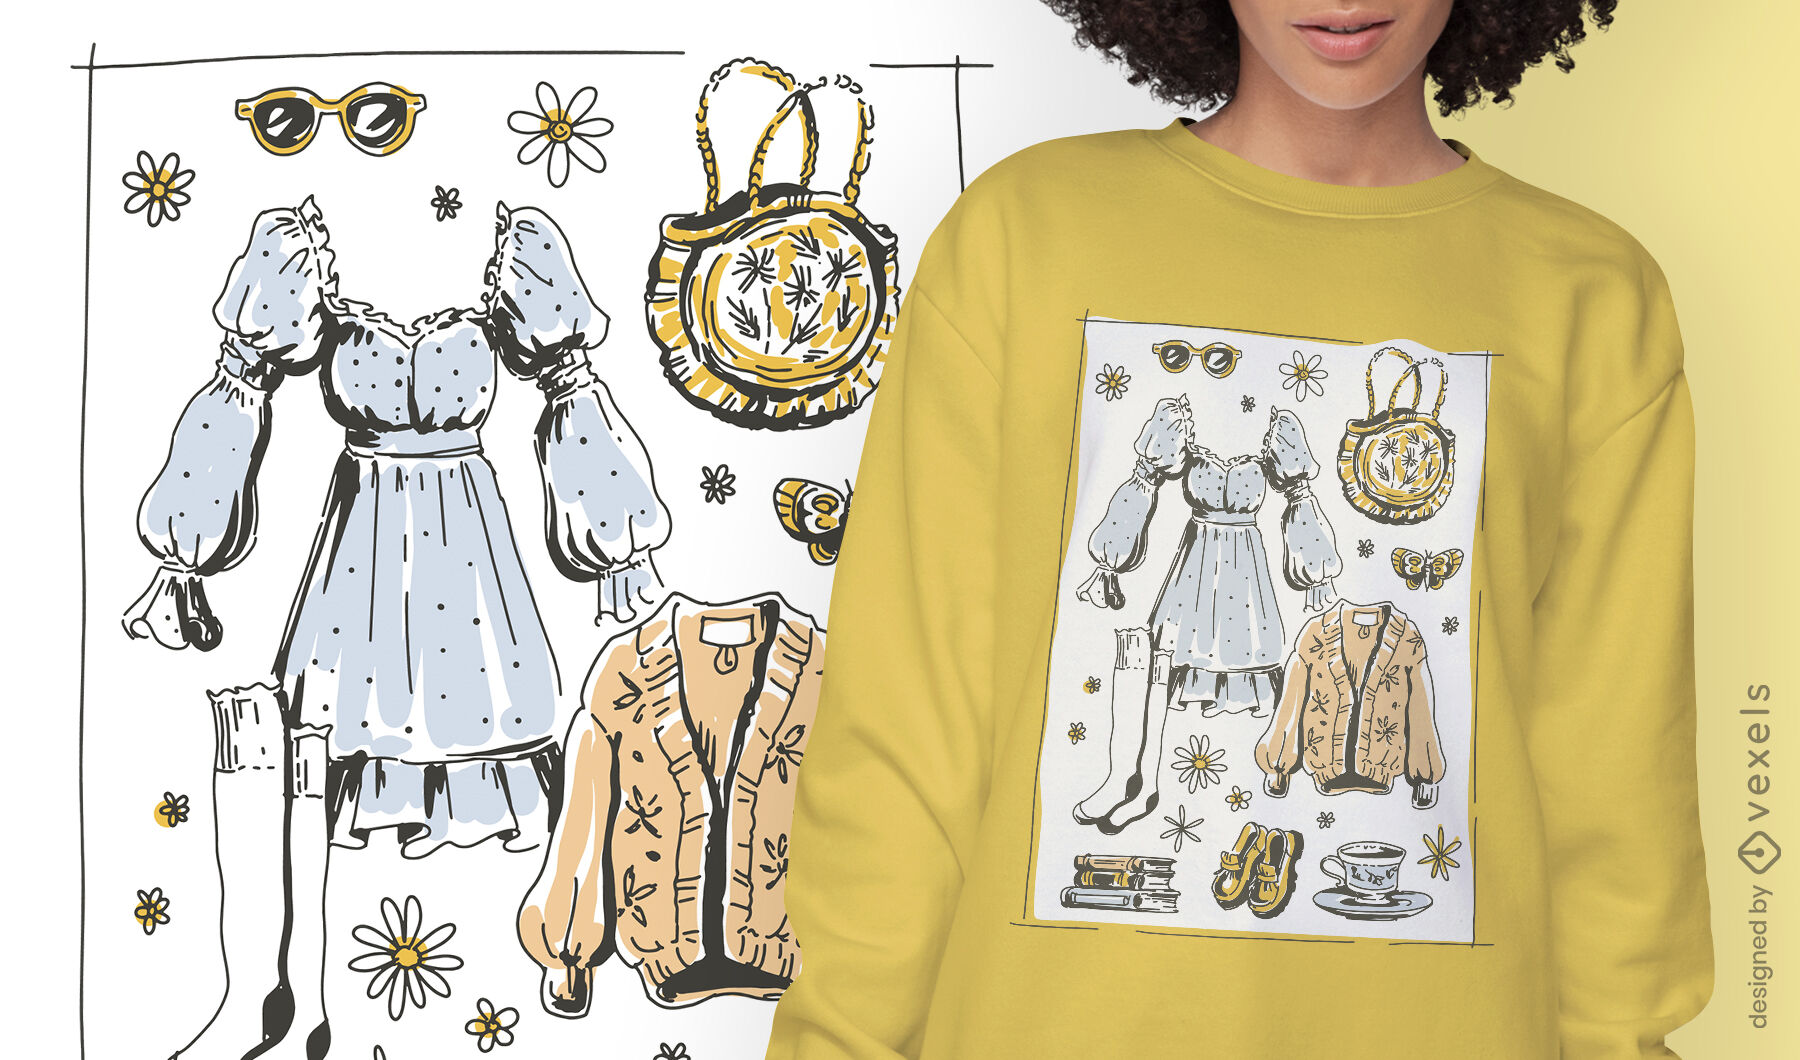 Cottagecore lifestyle fashion t-shirt design